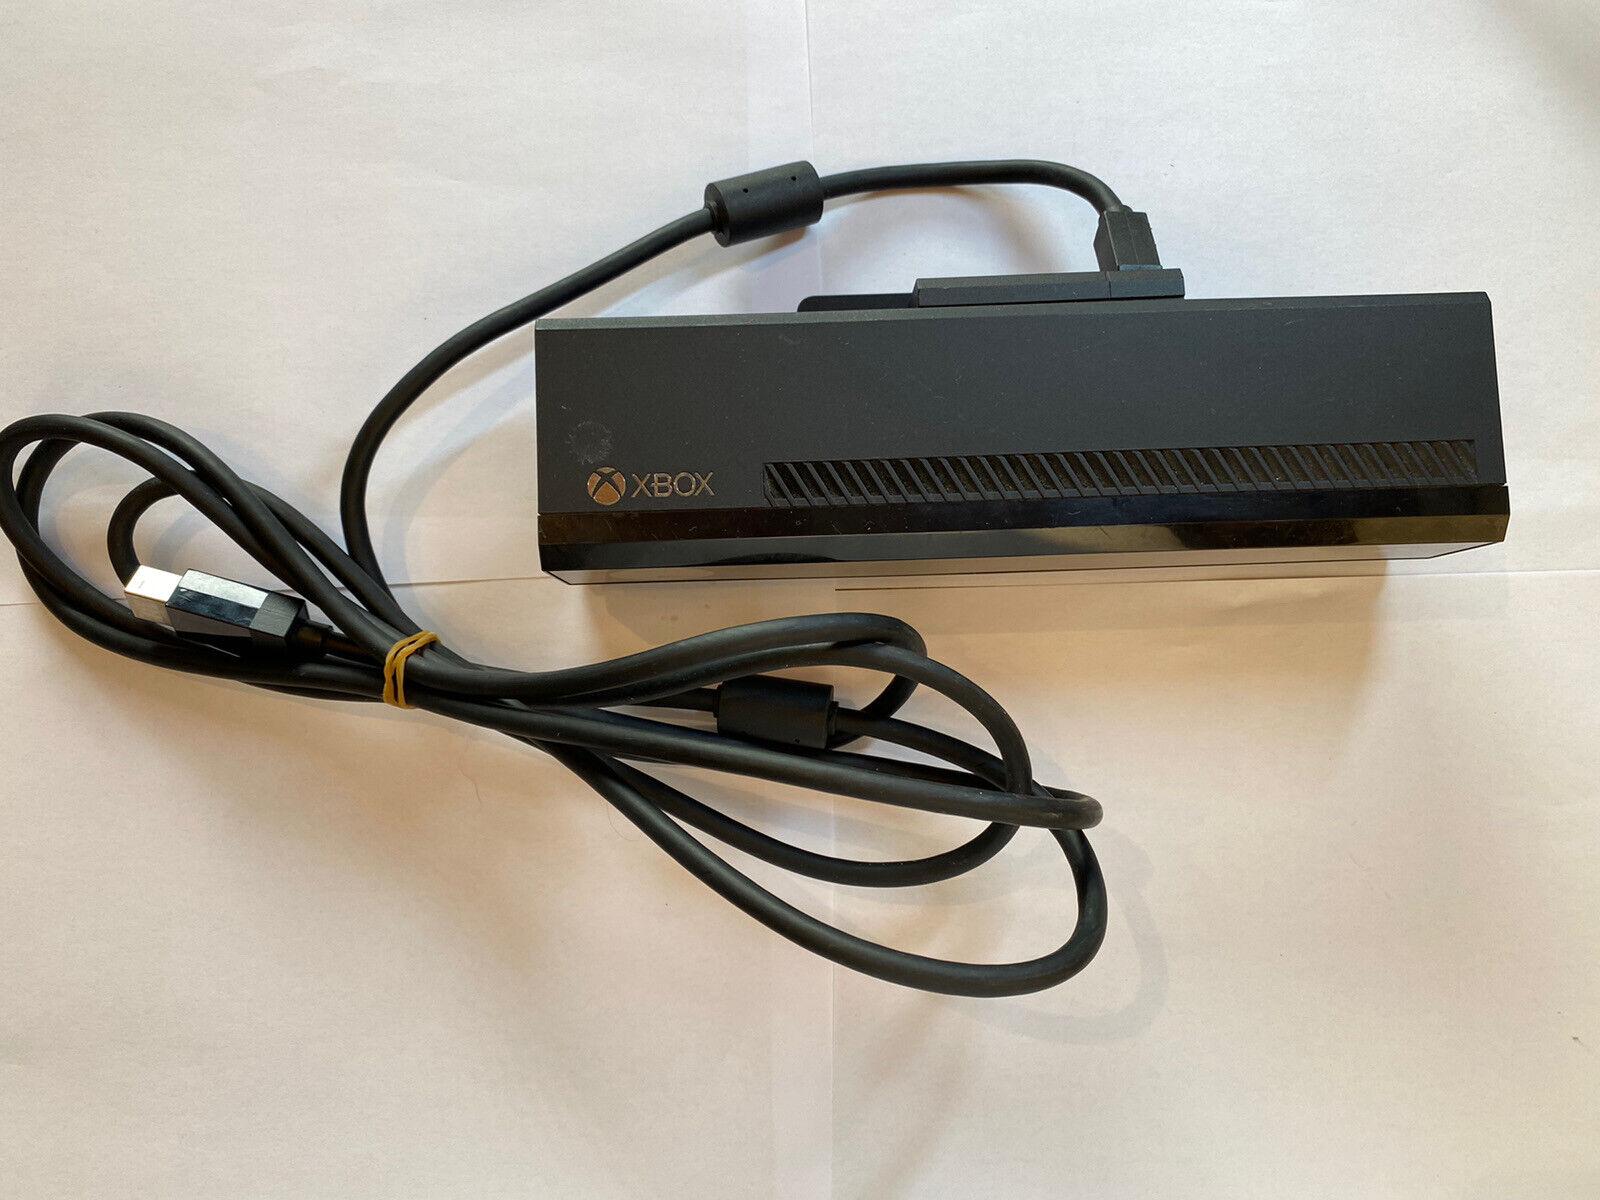 Xbox One Kinect Official Microsoft Controller Motion Sensor camera Black 1520